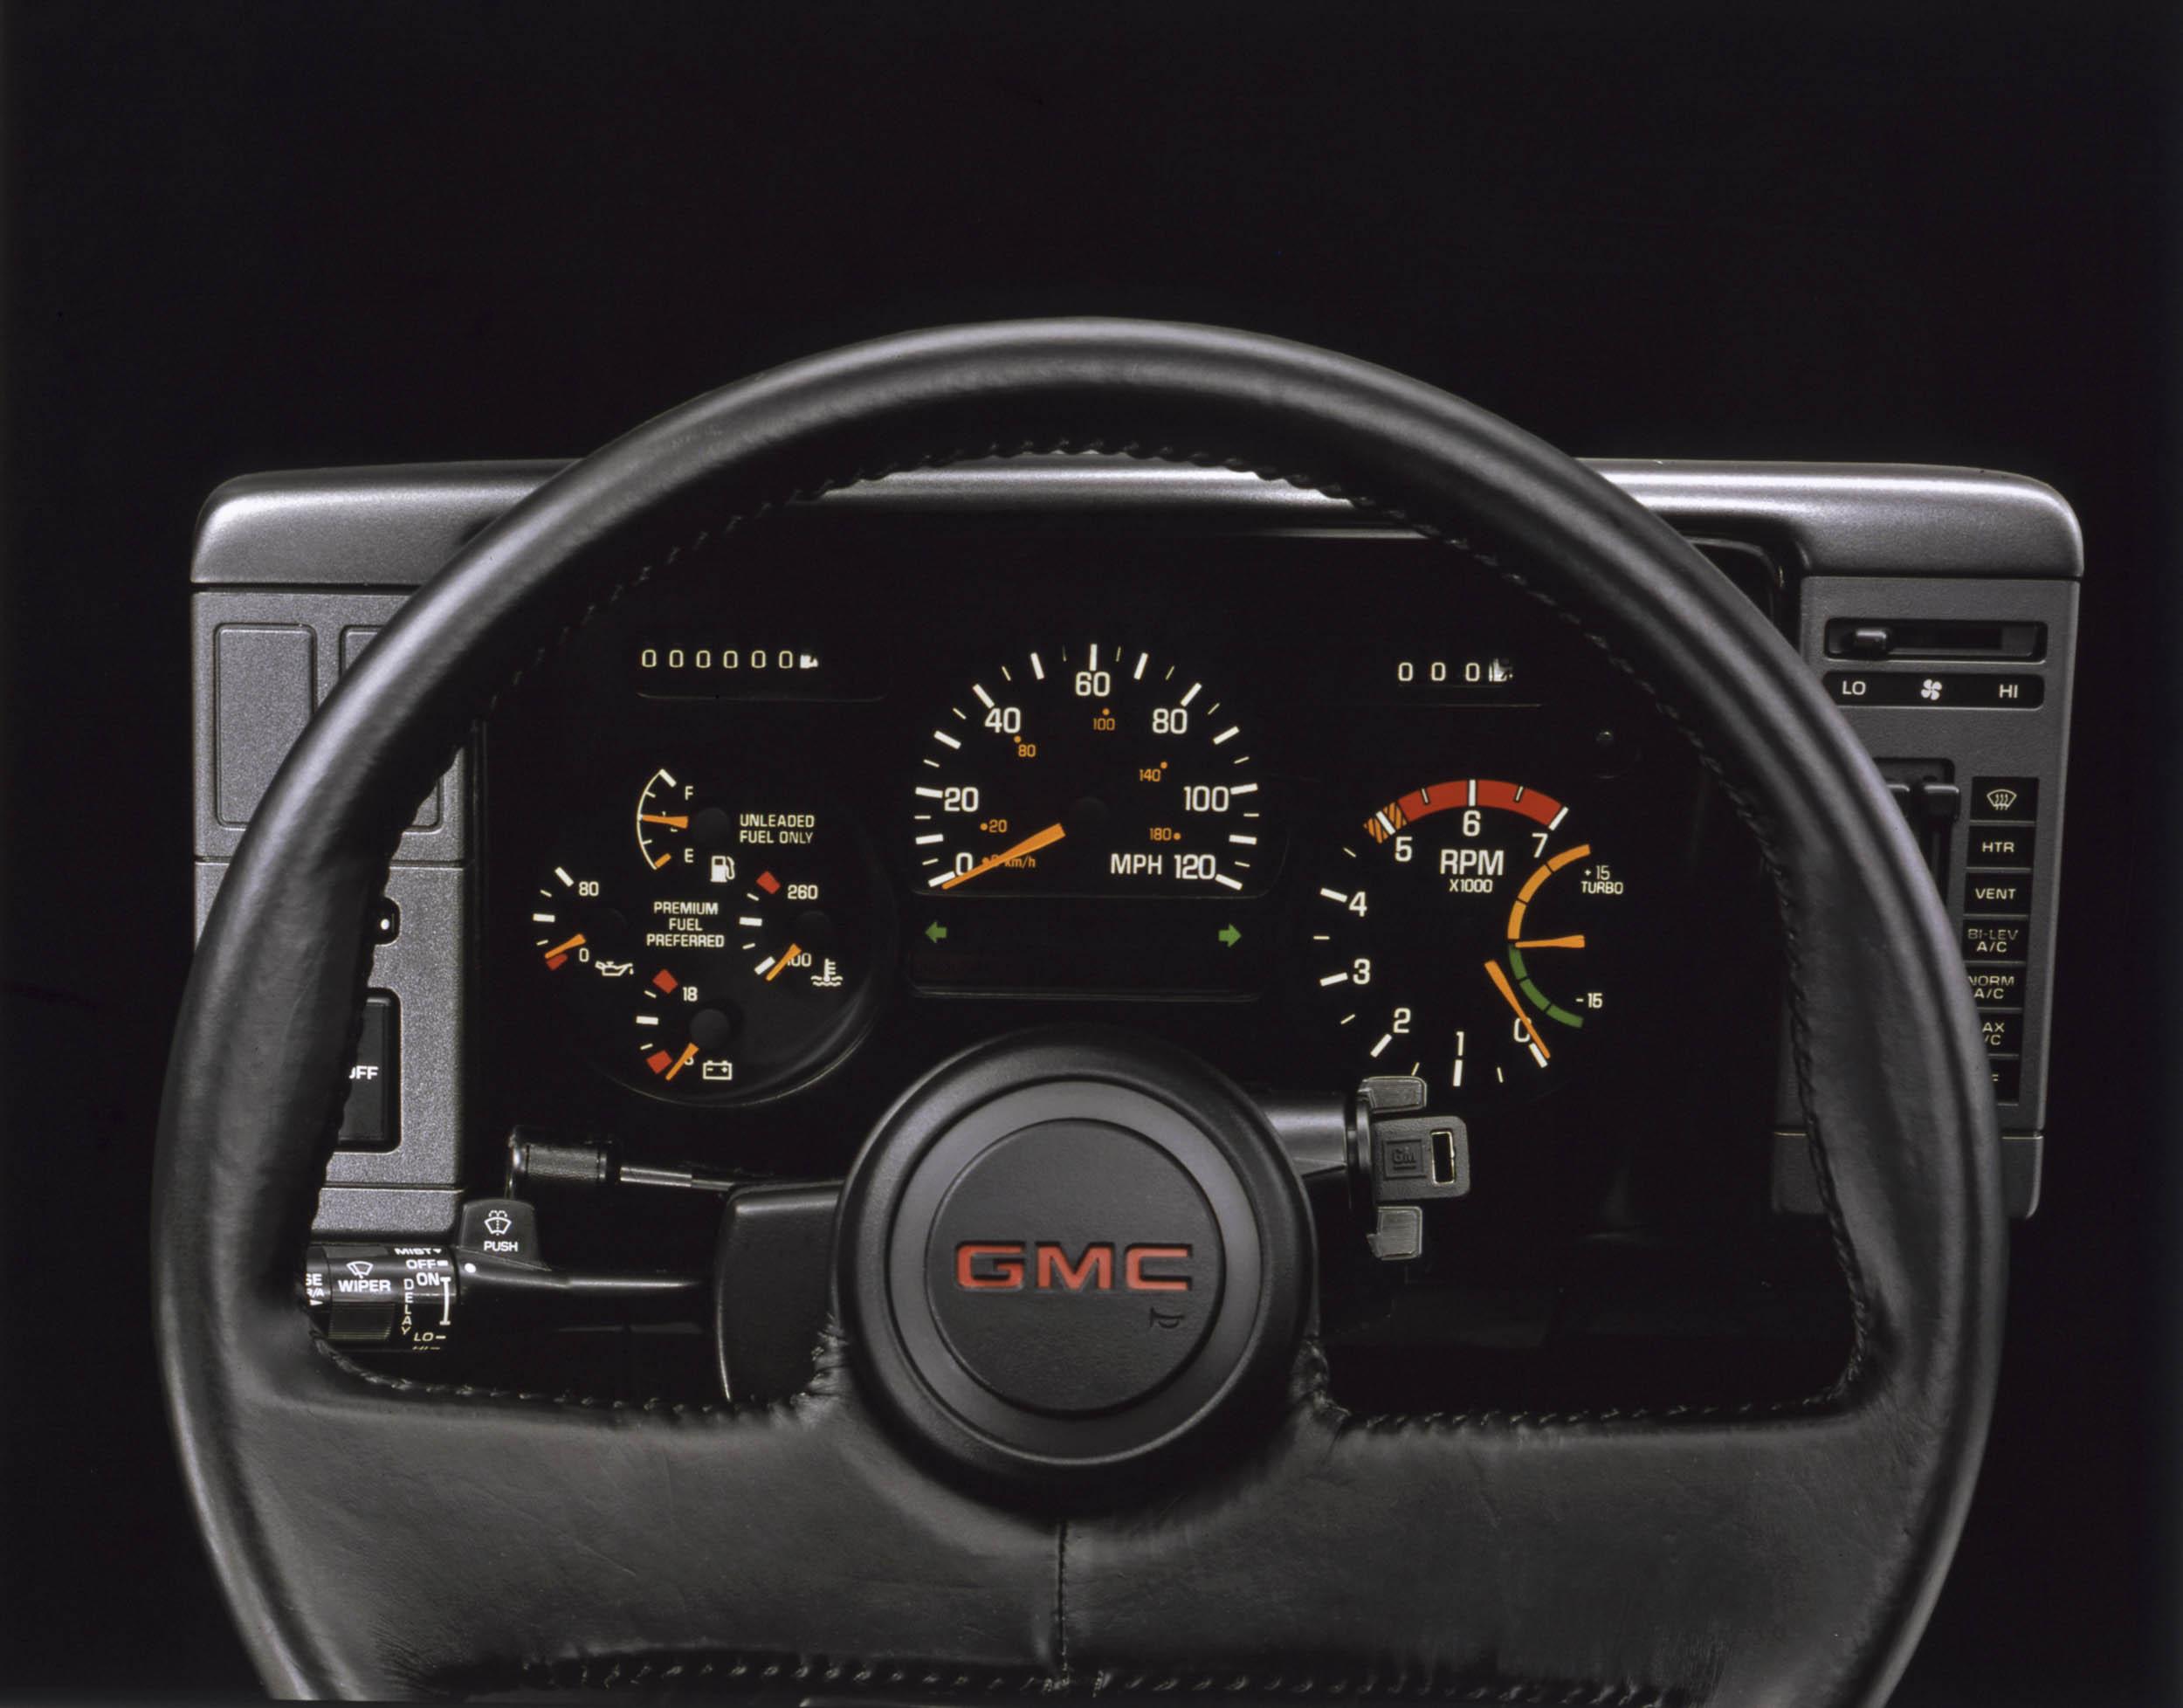 GMC Syclone gauge cluster